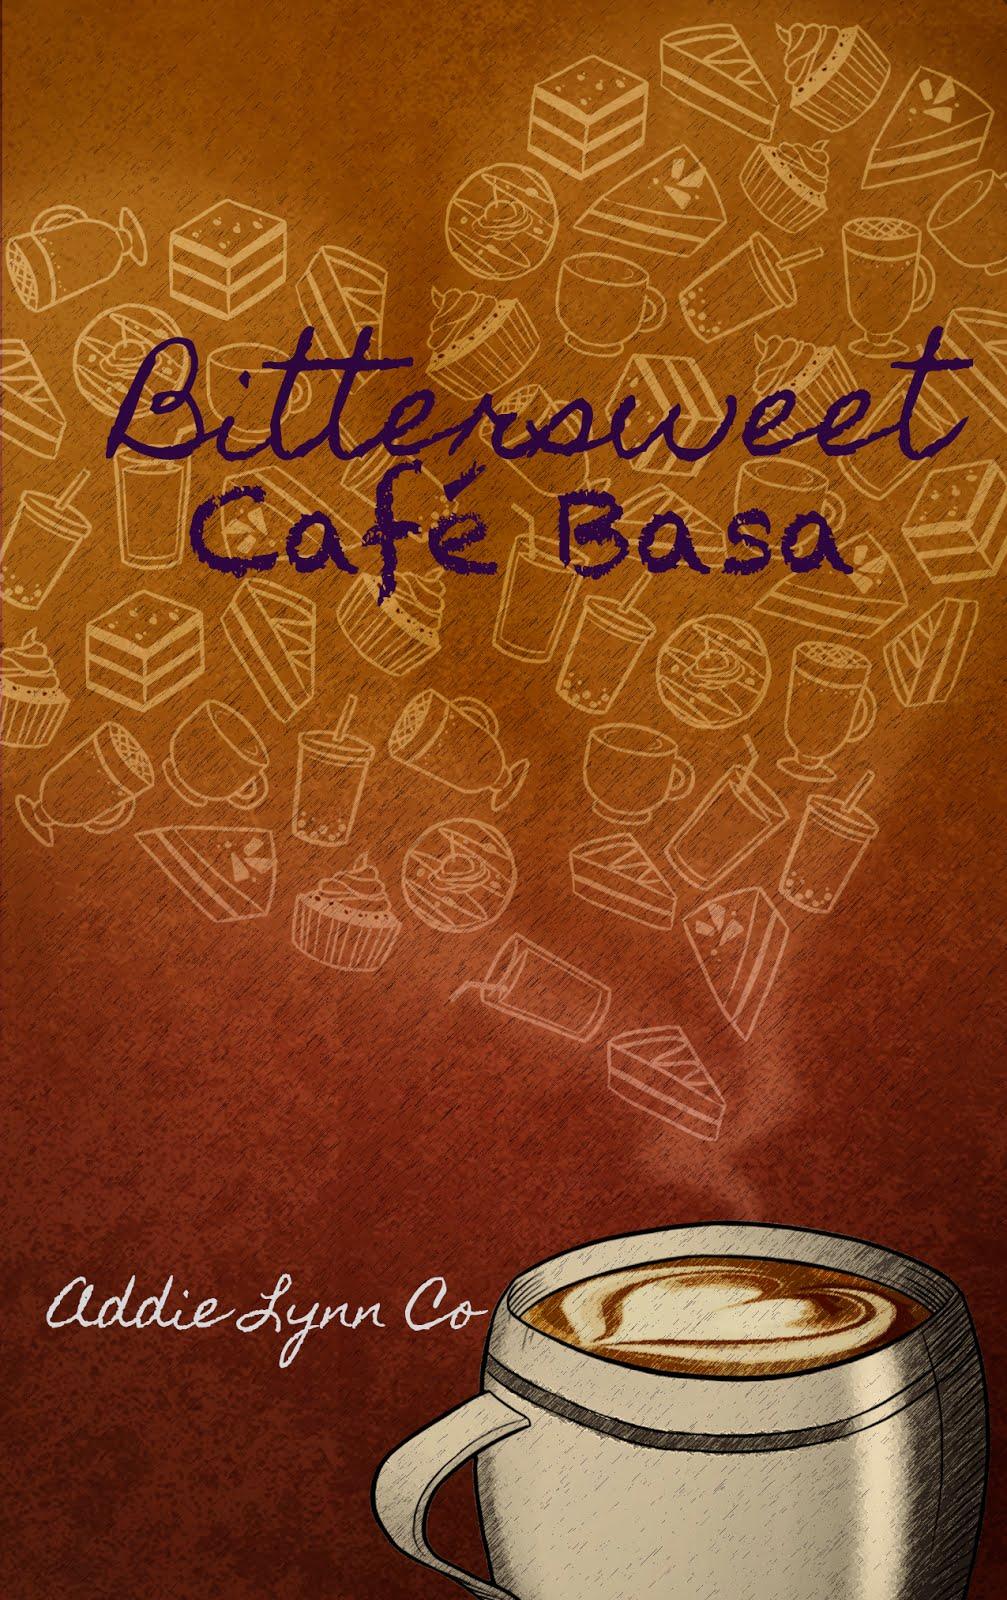 Bittersweet Café Basa